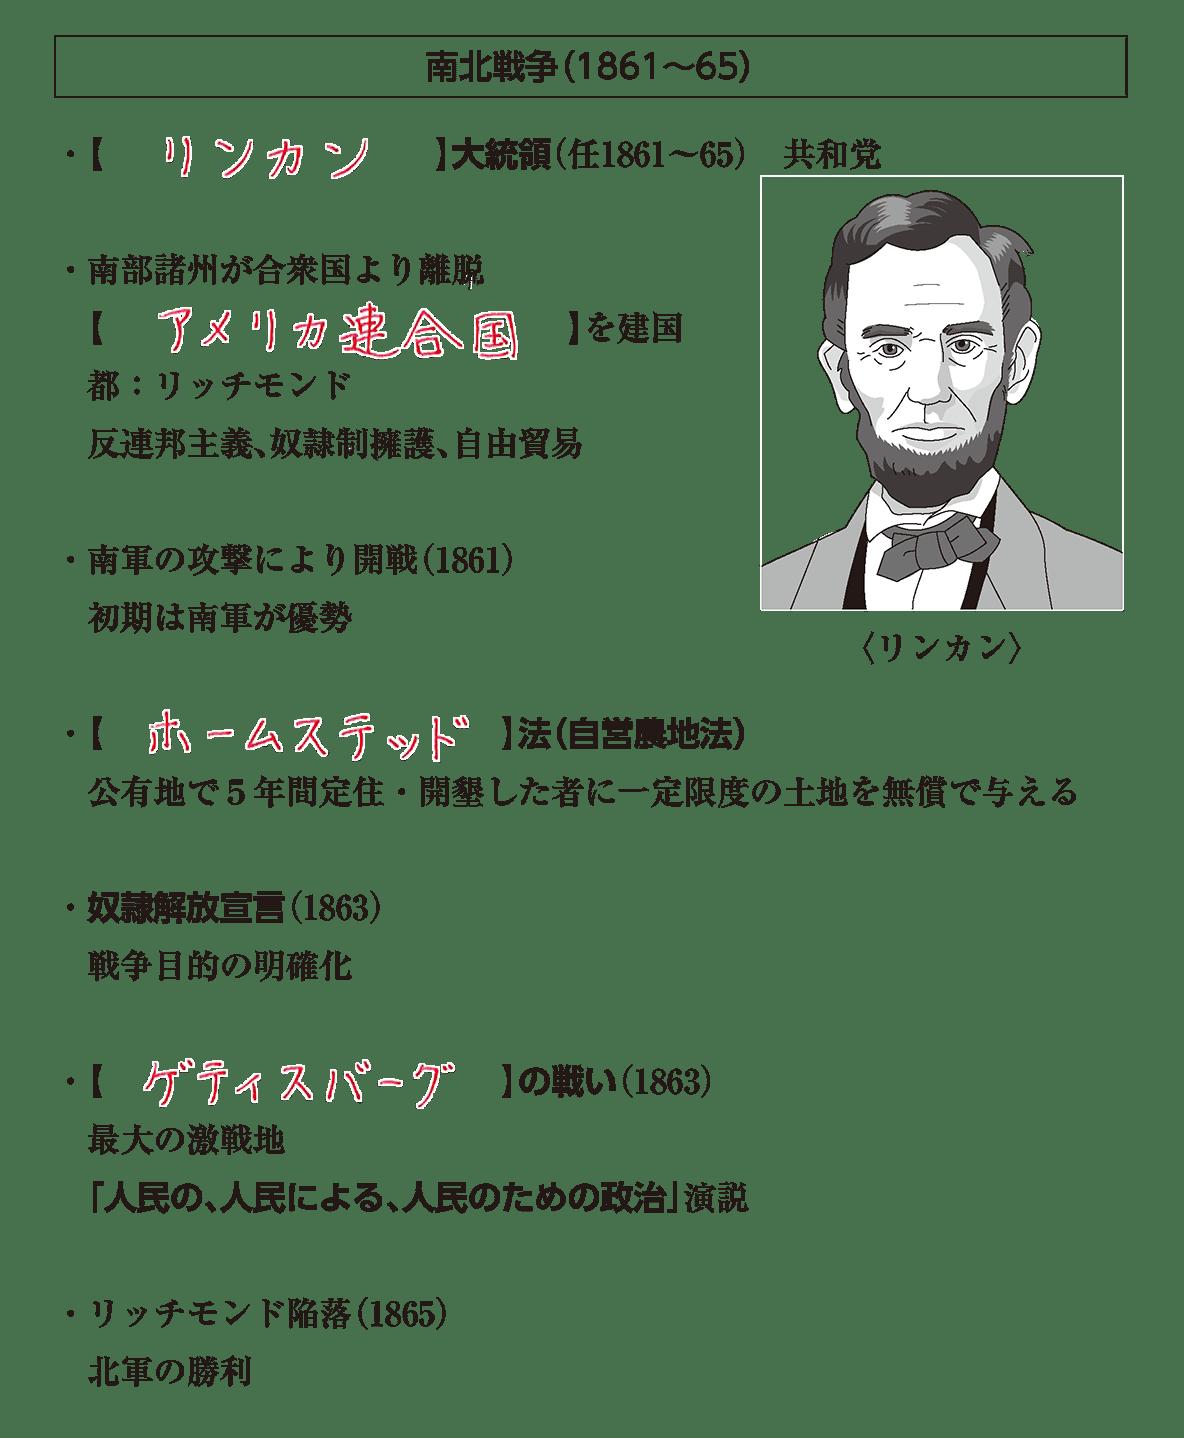 高校世界史 19世紀欧米諸国(2)5 ポイント1 答え全部